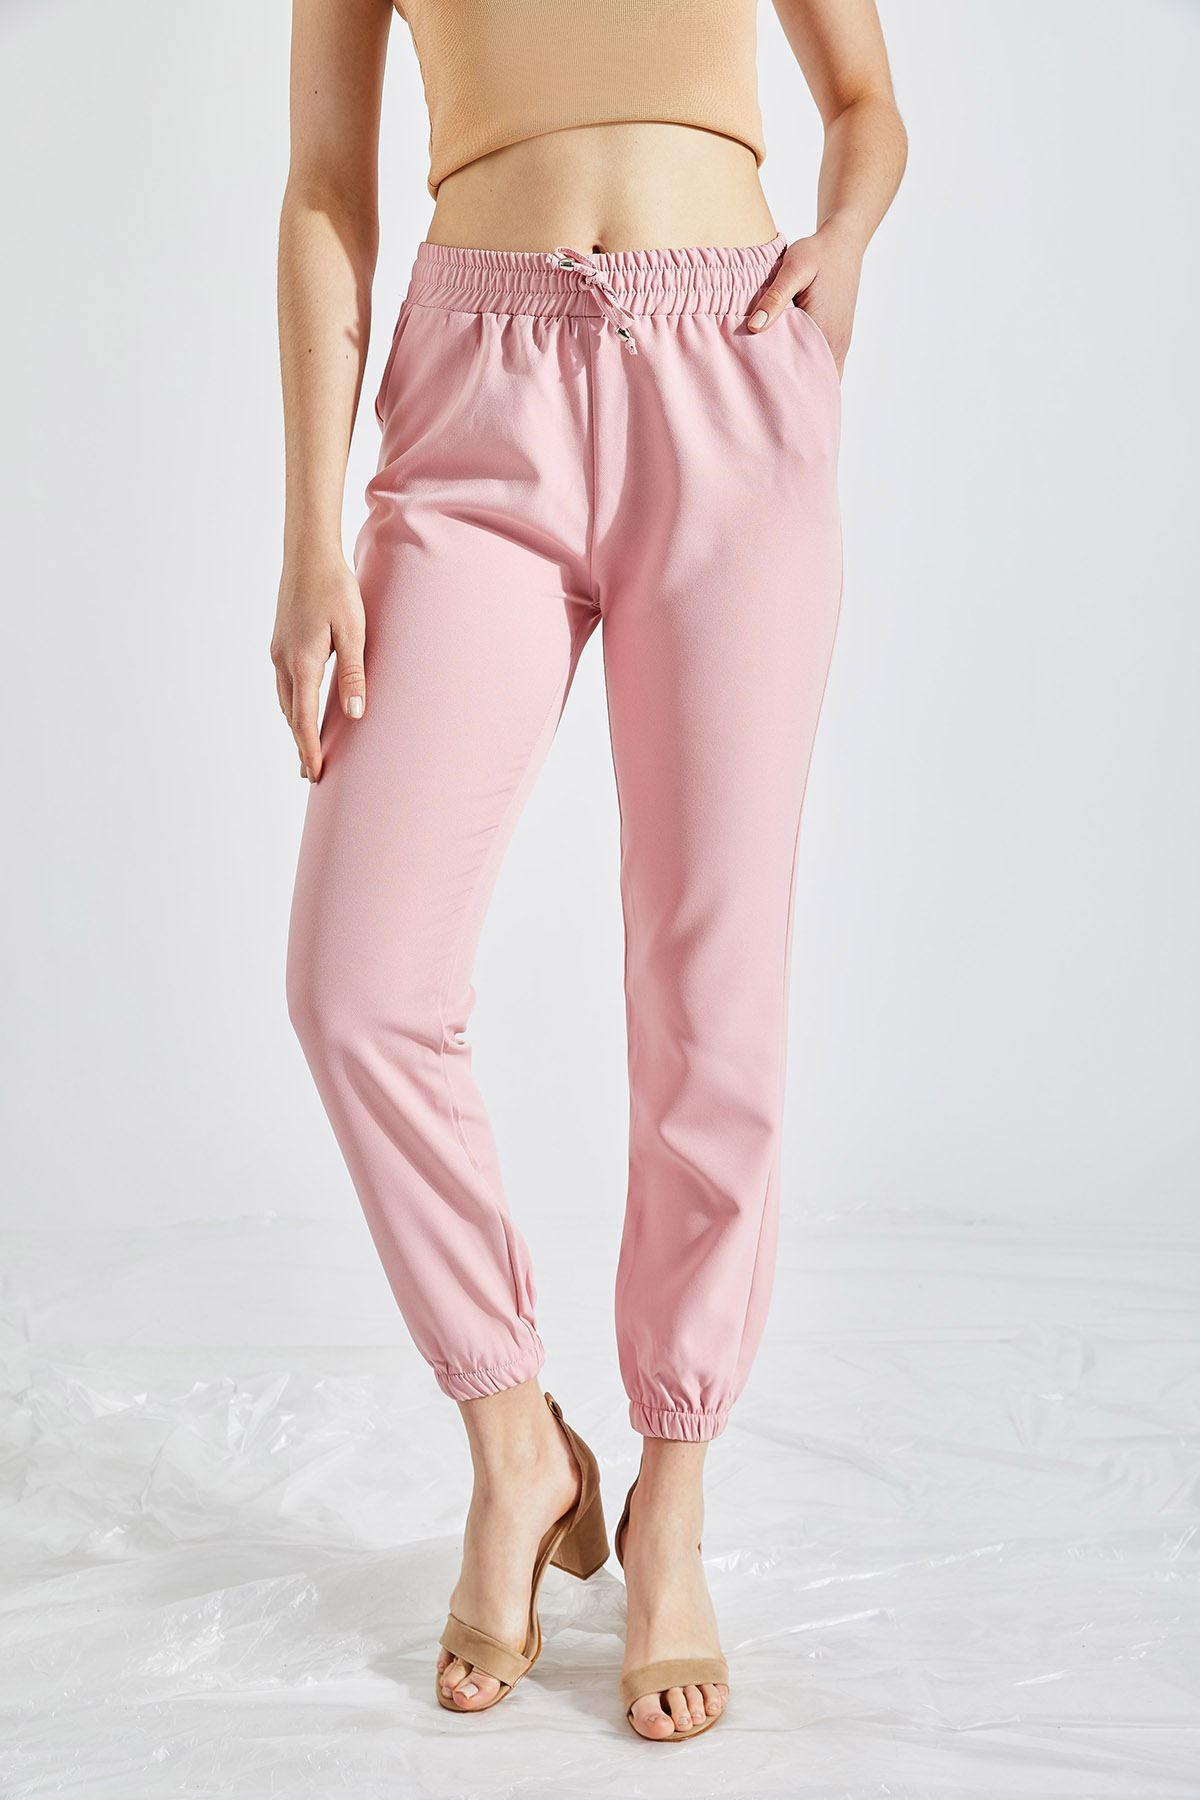 Kadın Bel Ve Paça Lastikli Pembe Kumaş Pantolon